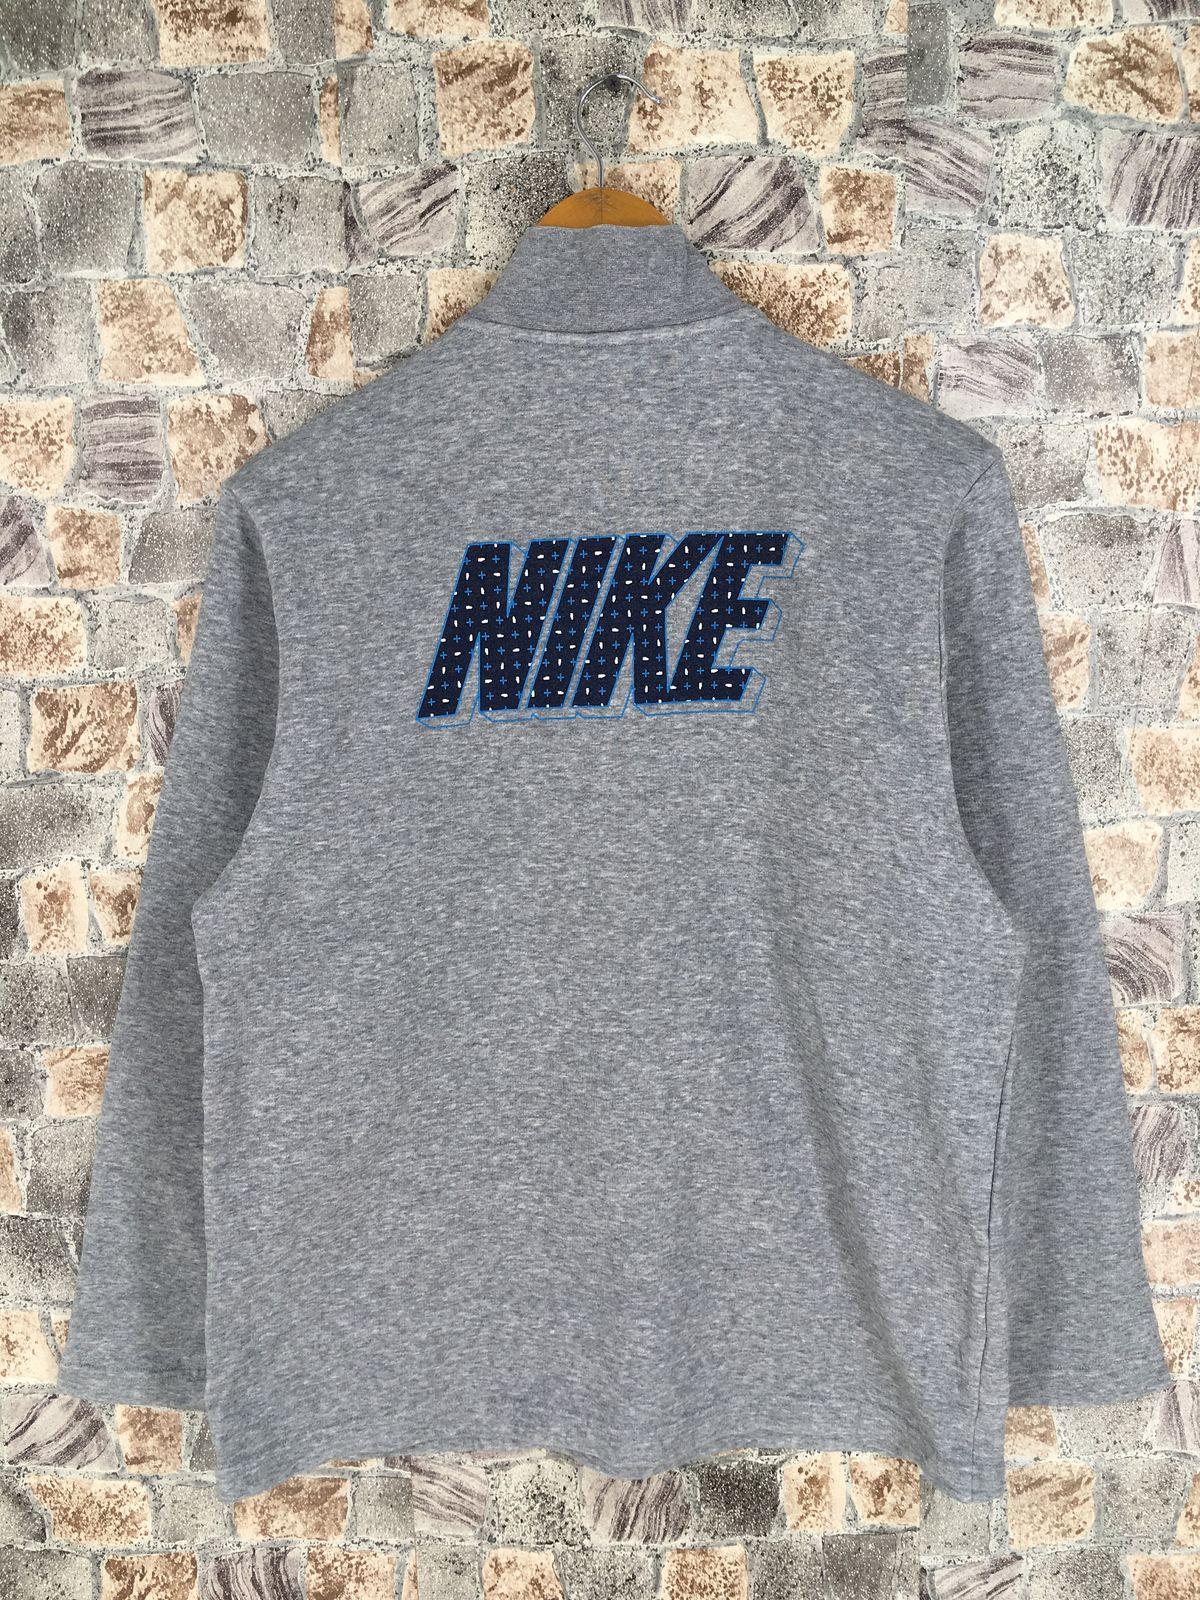 #clothing #women #sweater #halfzip #nikewindbreaker #nikesweatshirt #championsweater #filasweater #nikewomensweater